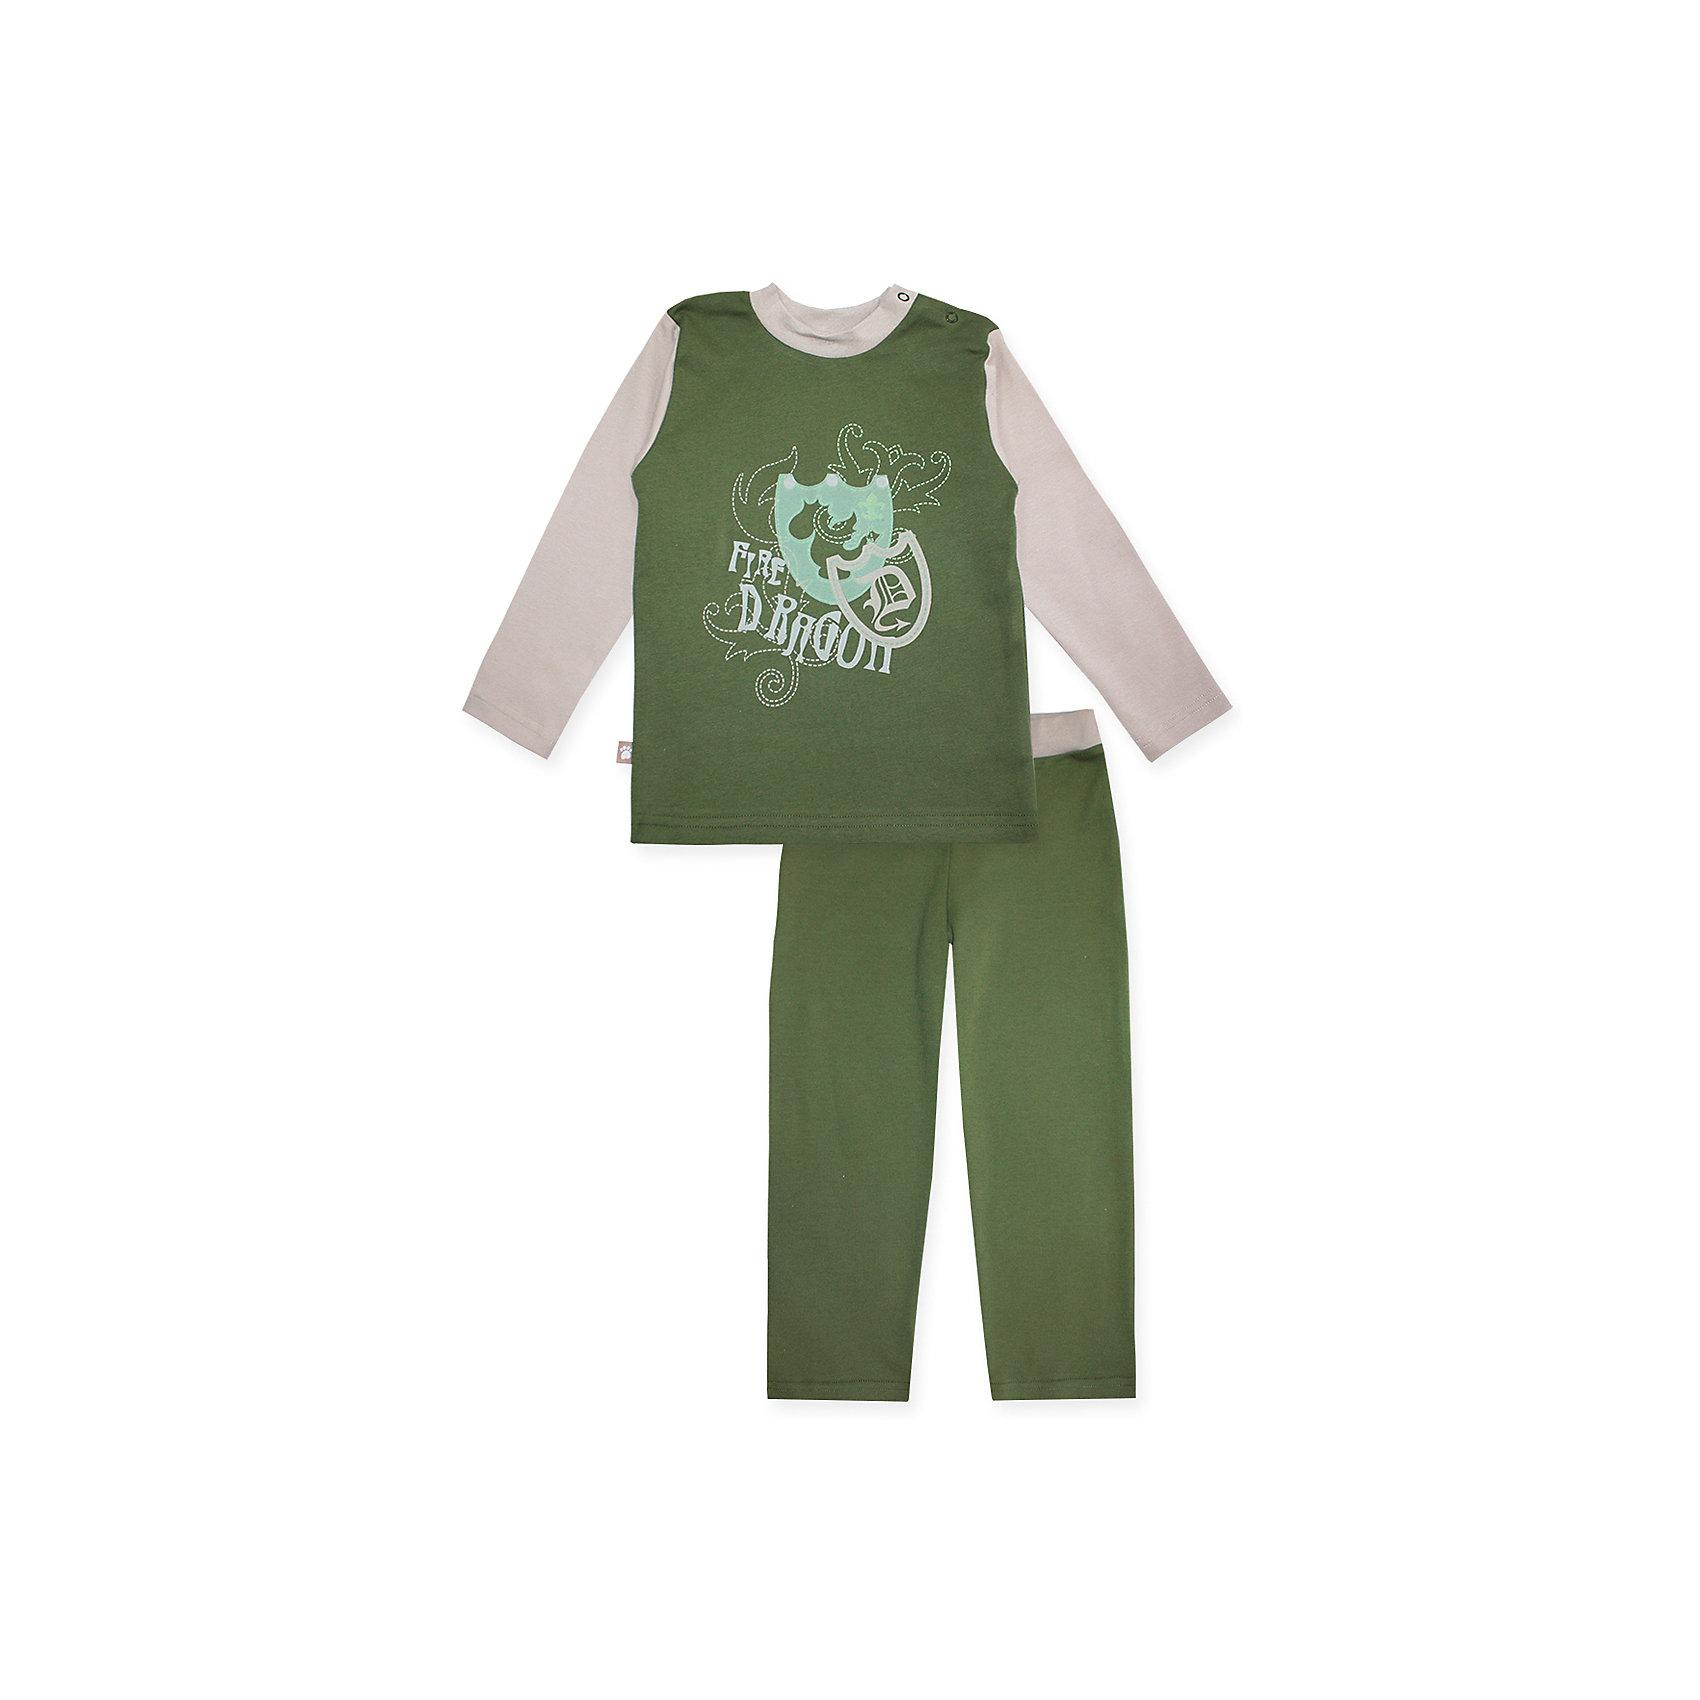 Пижама: футболка с длинным рукавом и штаны для мальчика КотМарКотПижама: футболка с длинным рукавом и штаны для мальчика от известного бренда КотМарКот<br>Состав:<br>100% хлопок<br><br>Ширина мм: 281<br>Глубина мм: 70<br>Высота мм: 188<br>Вес г: 295<br>Цвет: зеленый<br>Возраст от месяцев: 48<br>Возраст до месяцев: 60<br>Пол: Мужской<br>Возраст: Детский<br>Размер: 110,122,128,104,134,116<br>SKU: 4873341